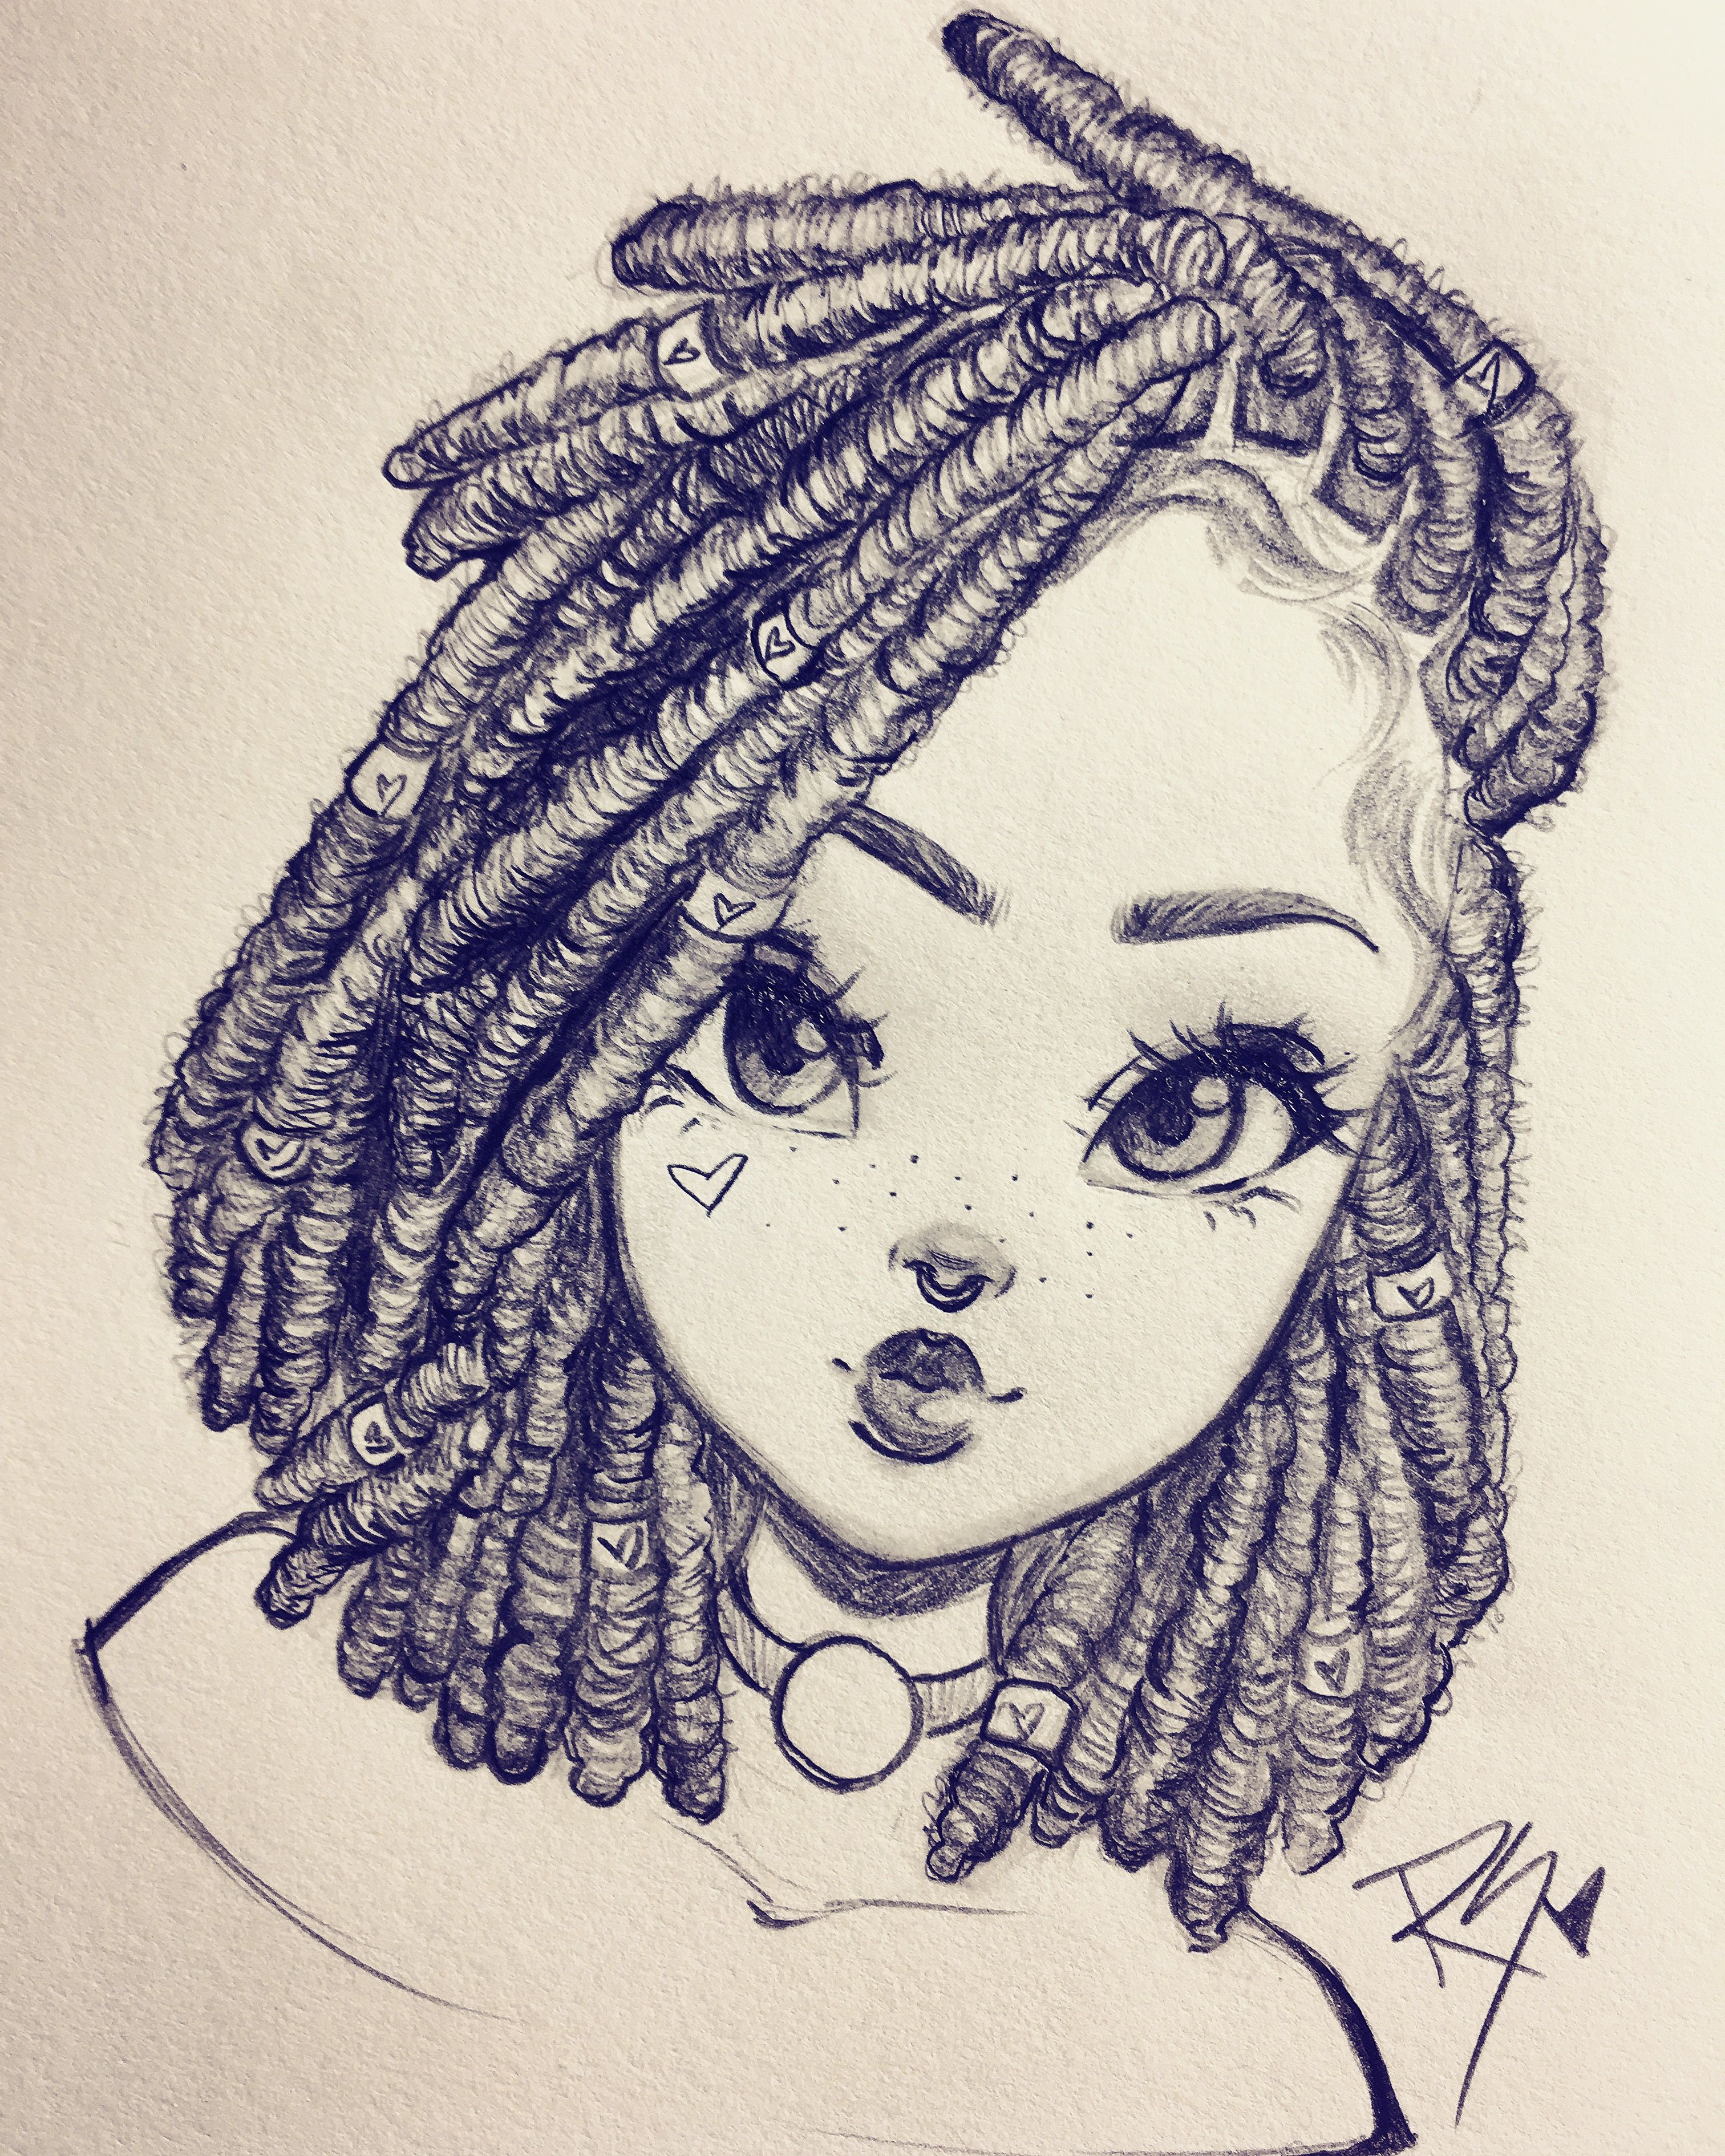 learn how to draw locs with christina lorré rawsueshii designs